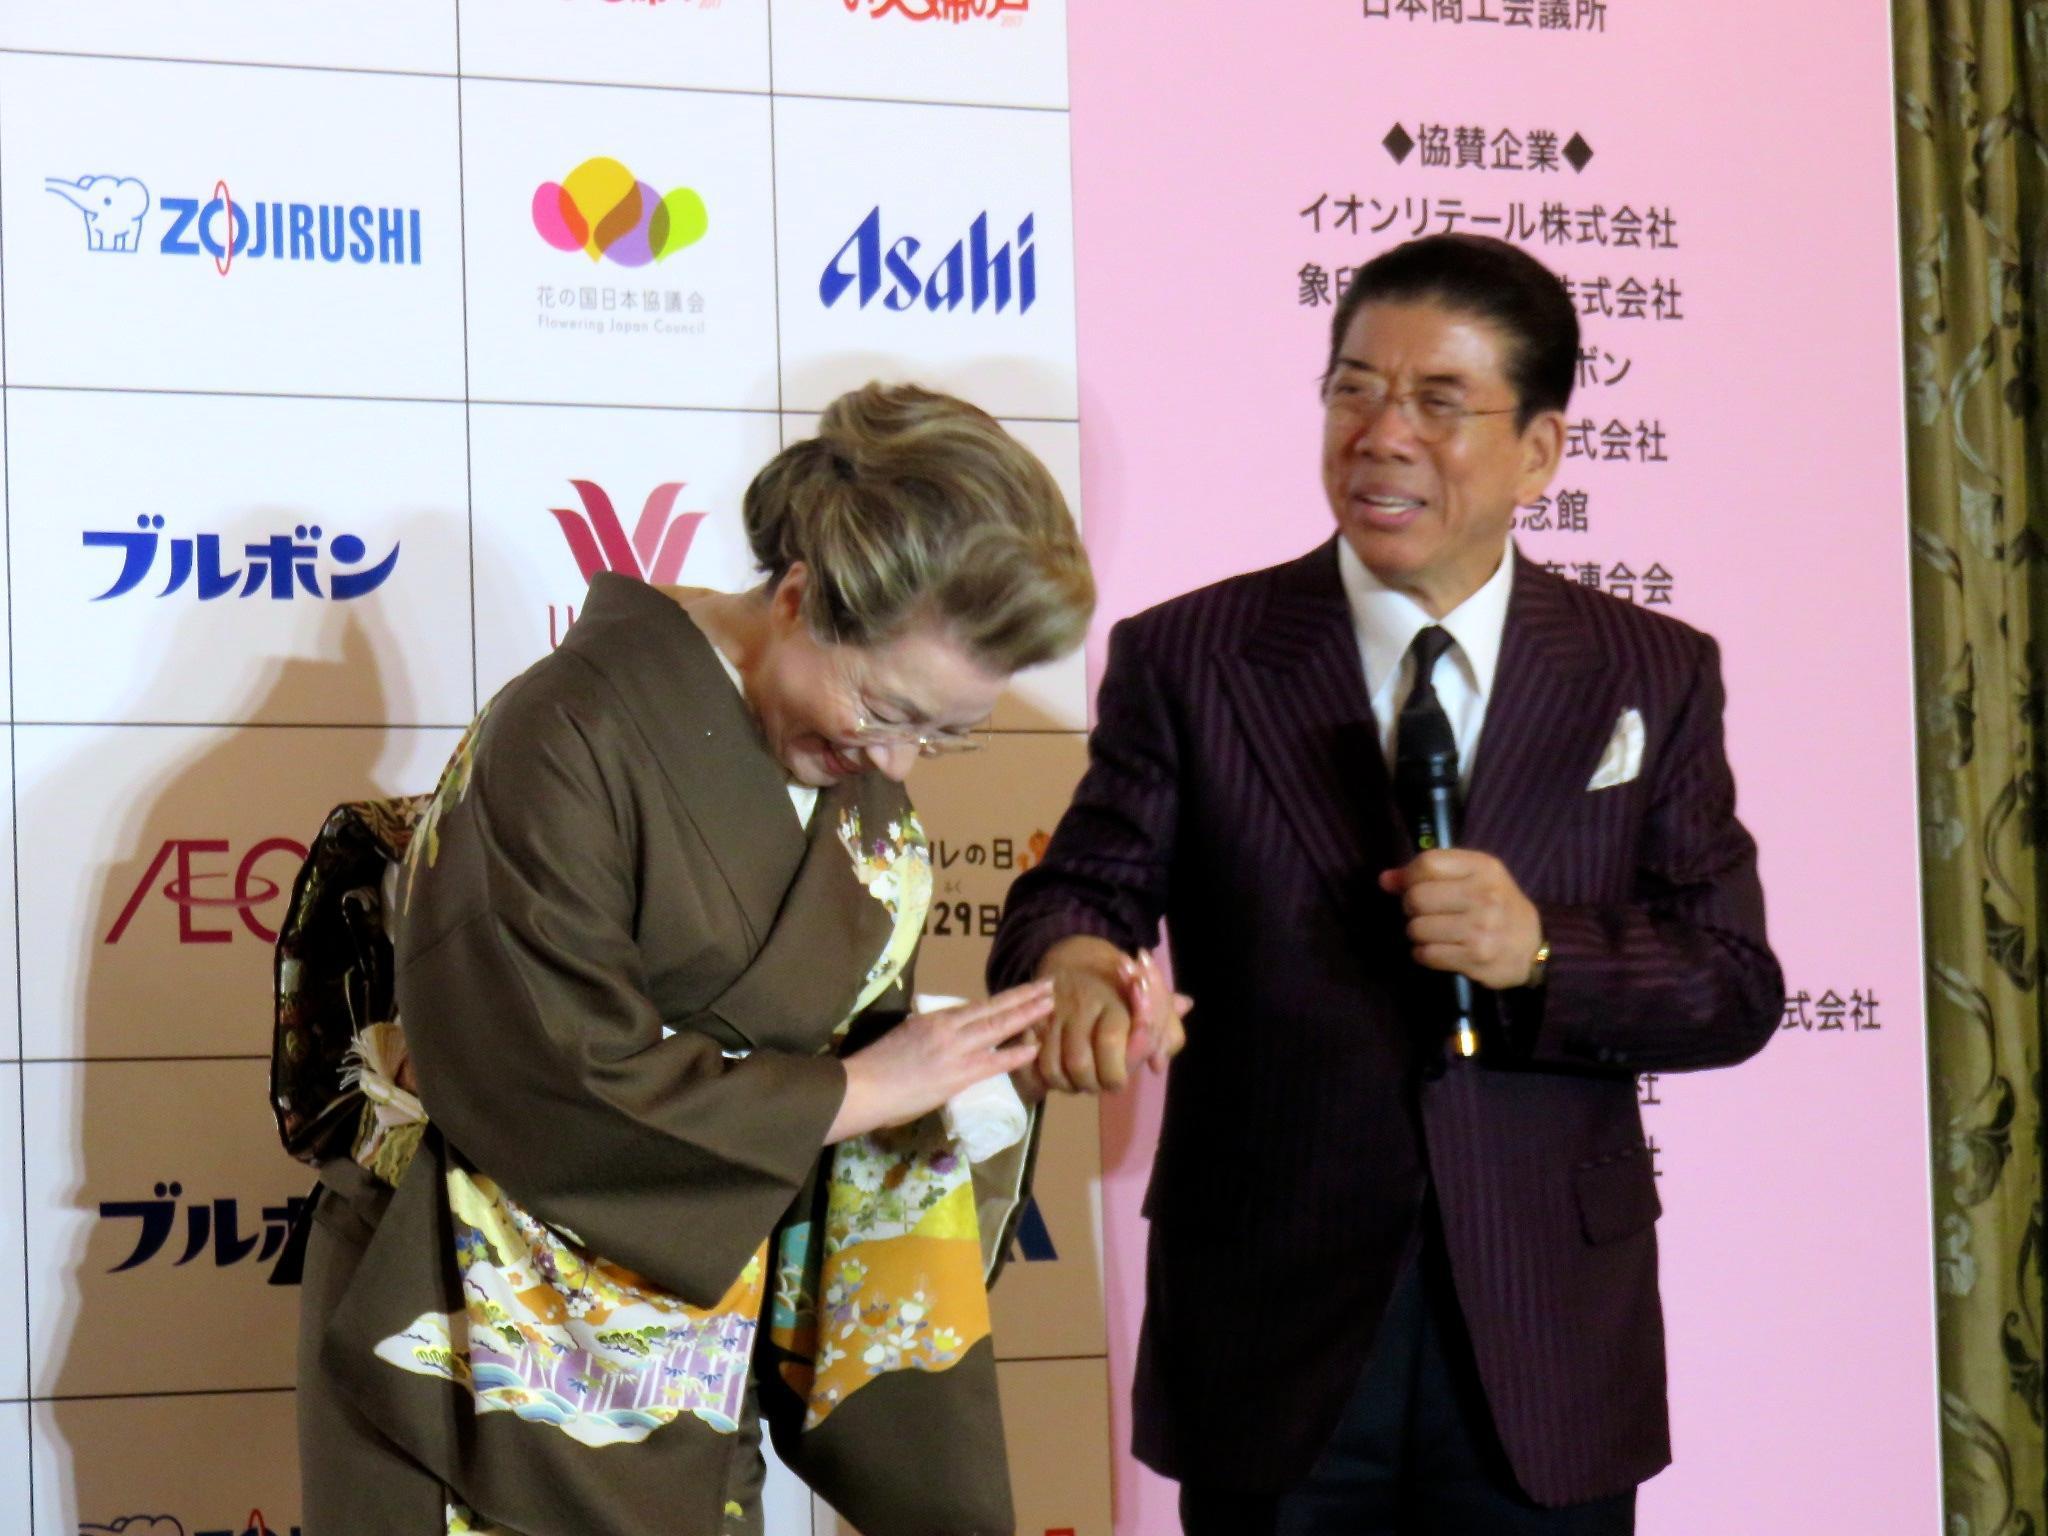 http://news.yoshimoto.co.jp/20171113222050-f9c763ff6631f09a586ae2ce1c9af03fa44d201f.jpg